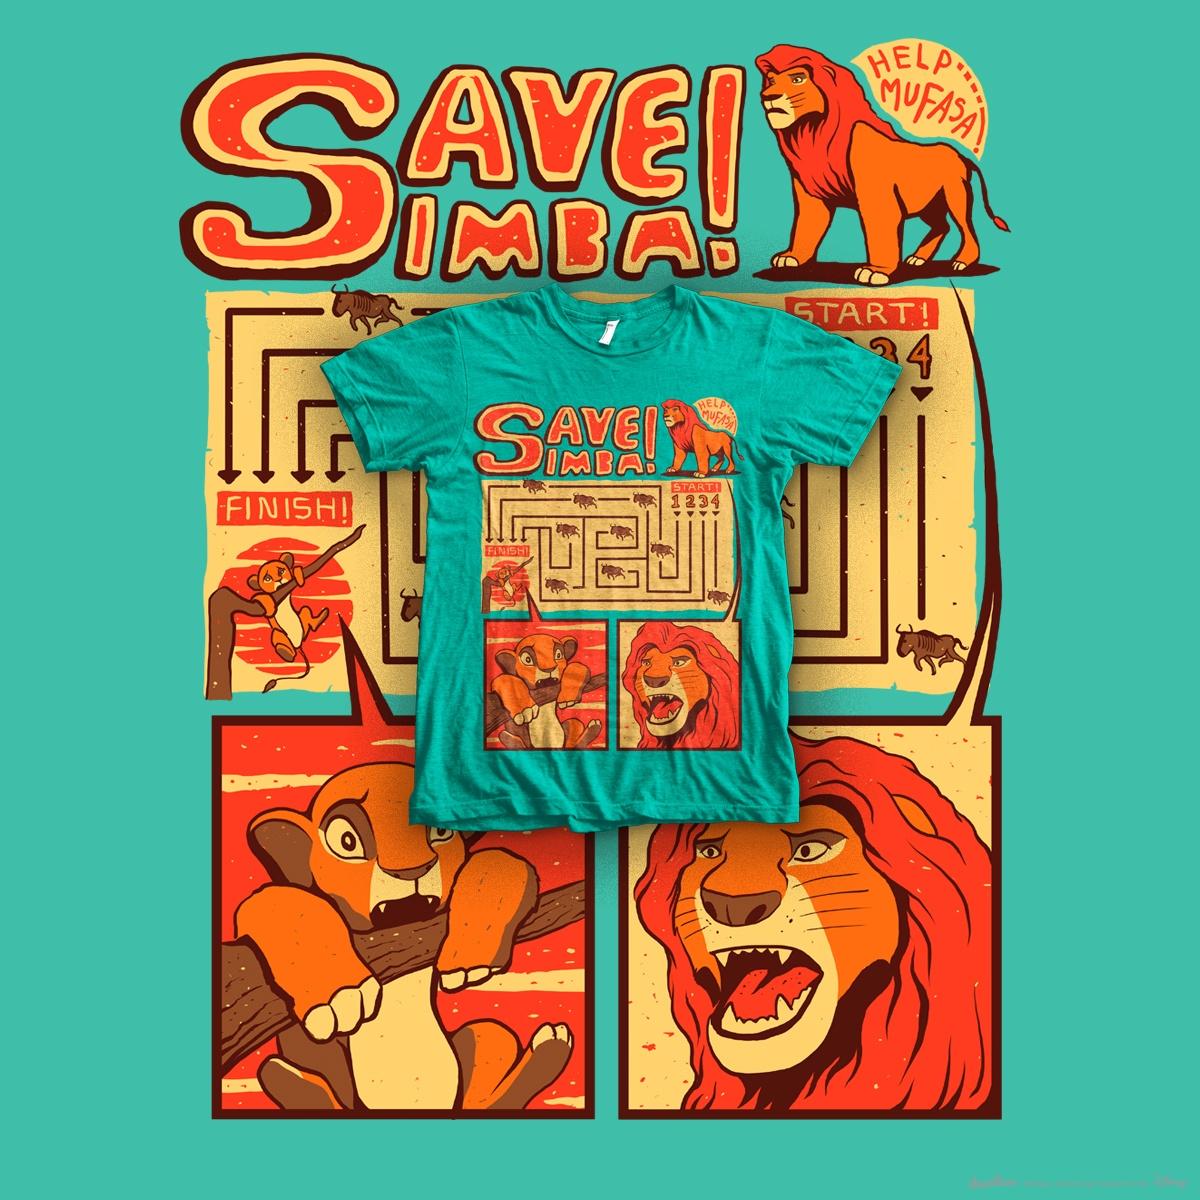 Save Simba!! by Aji ontowiryo on Threadless